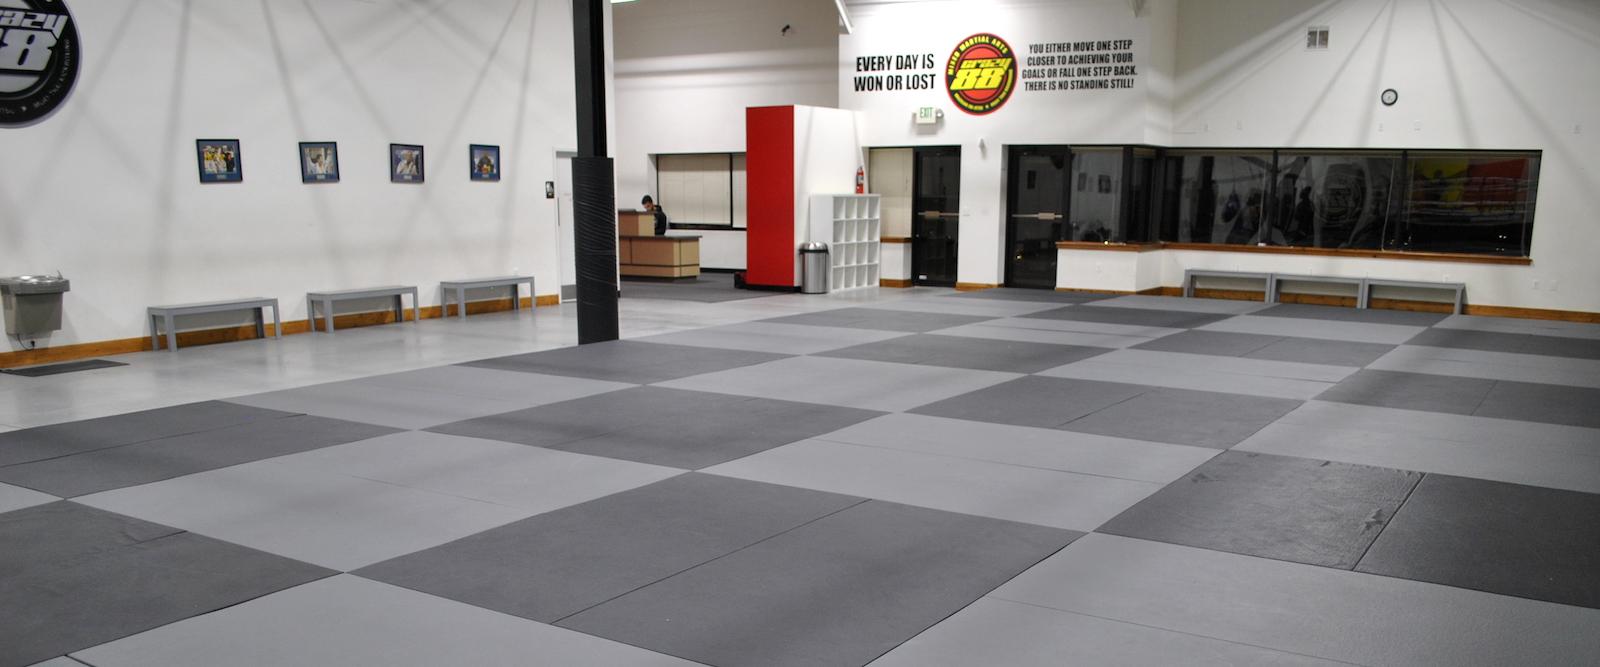 Crazy 88 MMA - Elkridge MD - Striking Gym